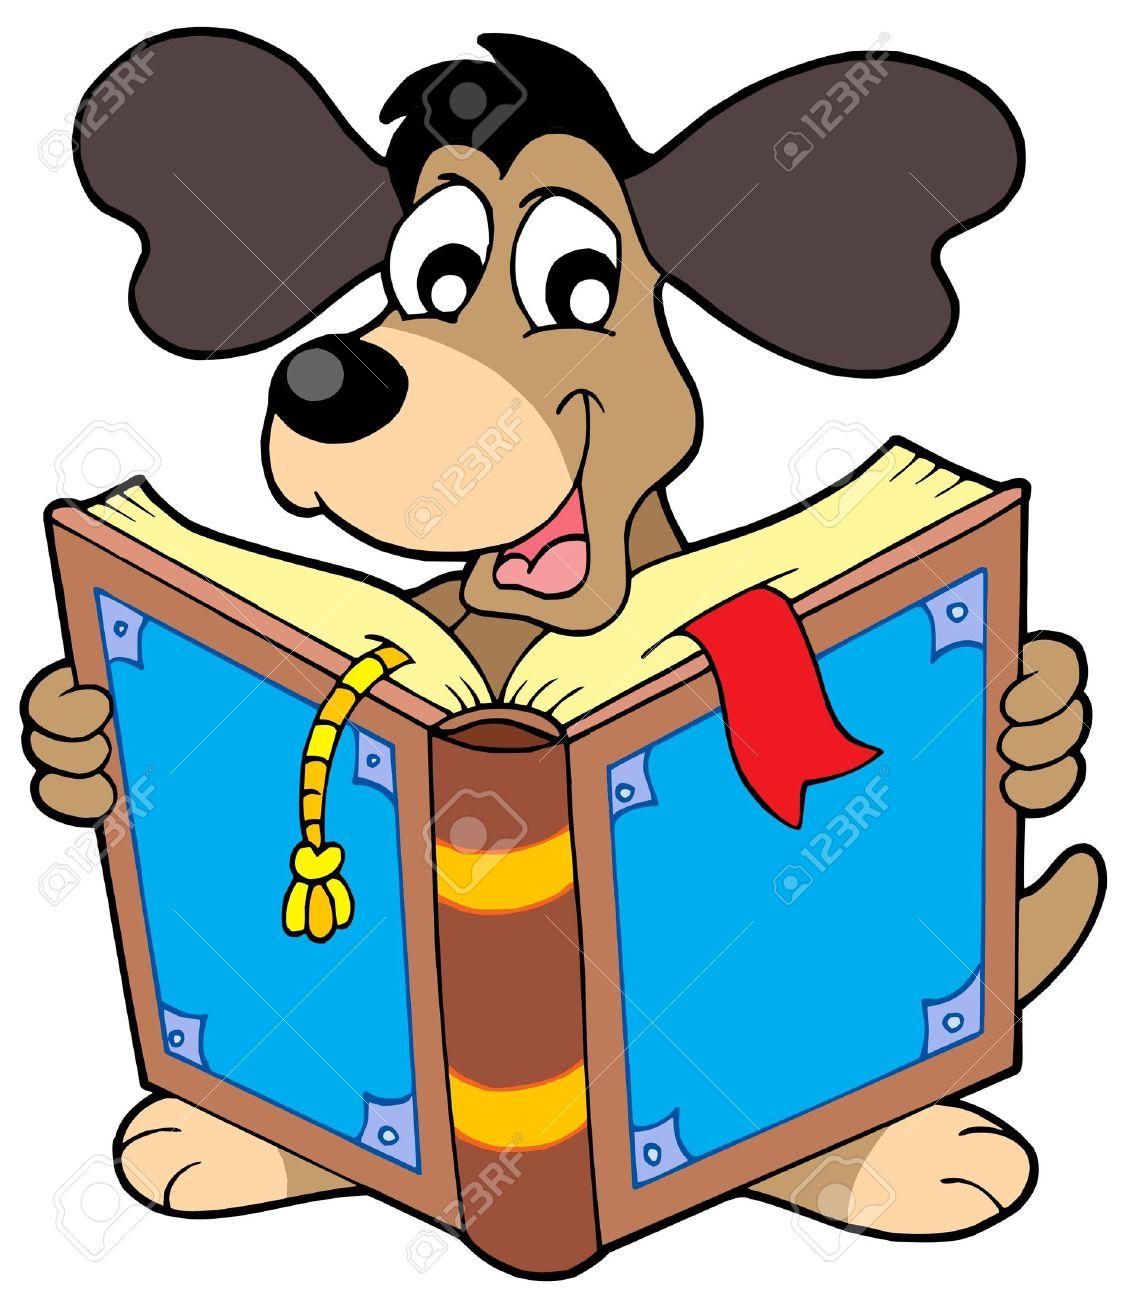 Dog reading book - vector illustration. Stock Vector - 4369089